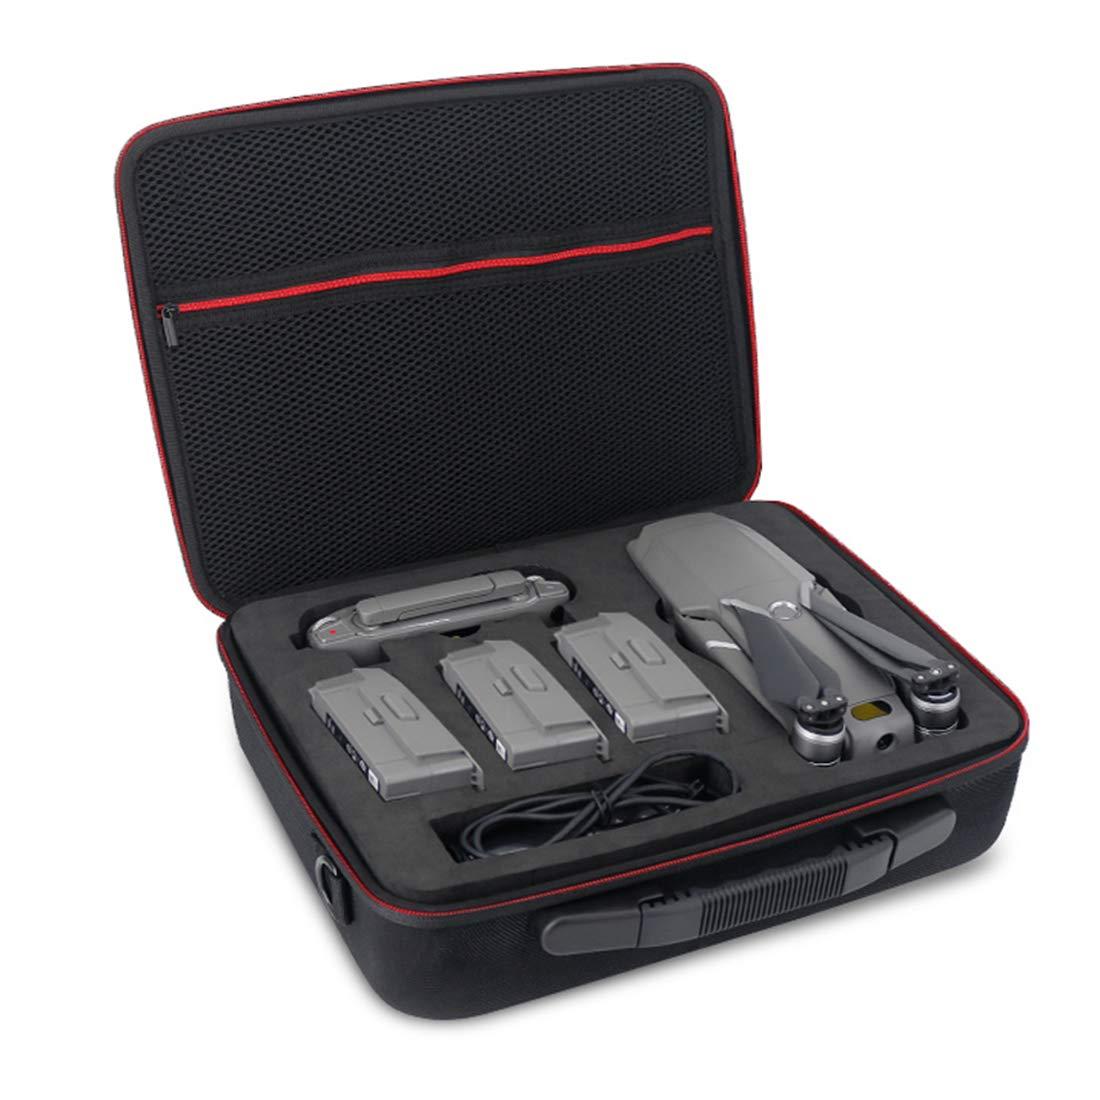 Yamix Shoulder Bag Travel Bag Carrying Case Carrying Bag with 4 Batteries Storage Case for DJI Mavic 2 PRO/ Mavic 2 Zoom - 1680D